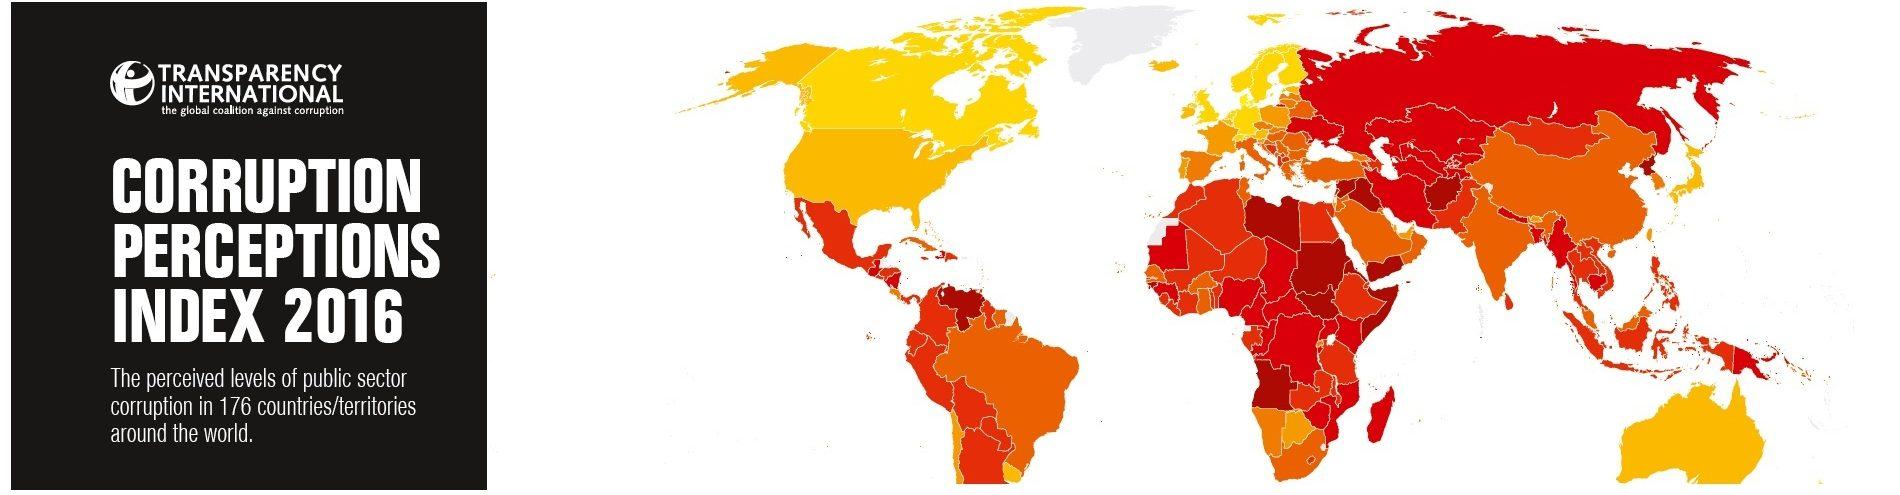 transparency international hungary